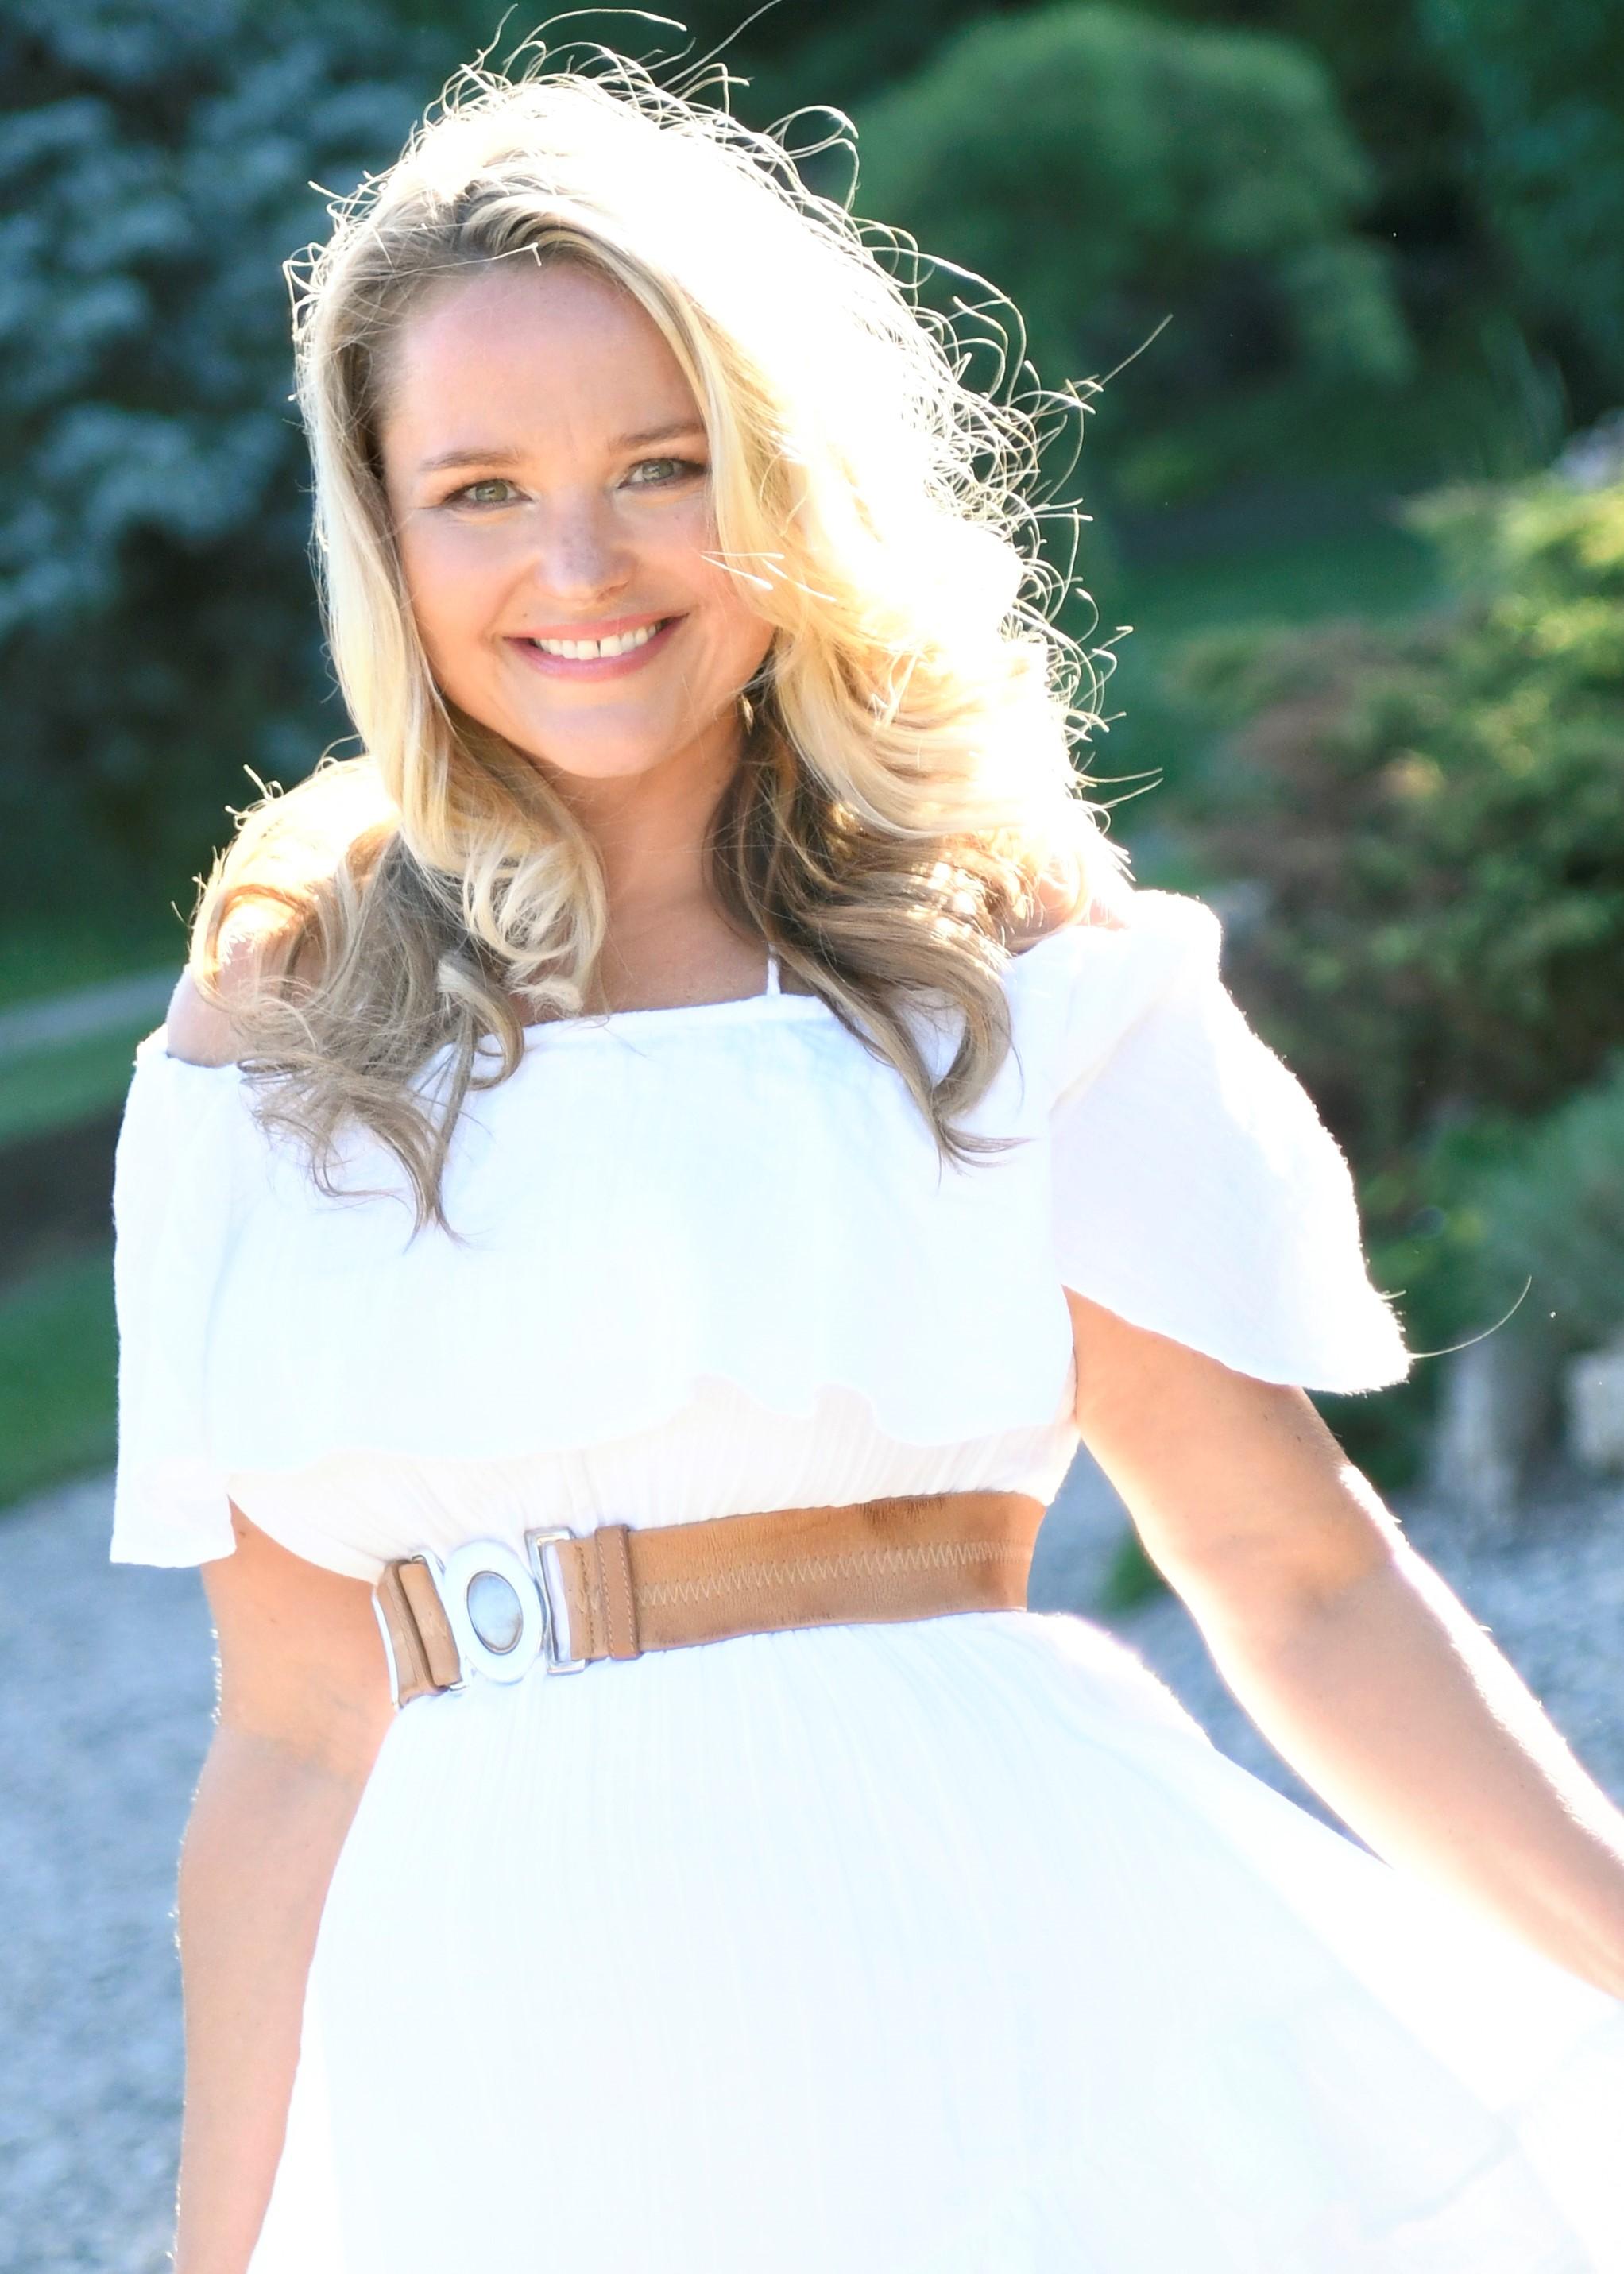 Leah Simon Clarke